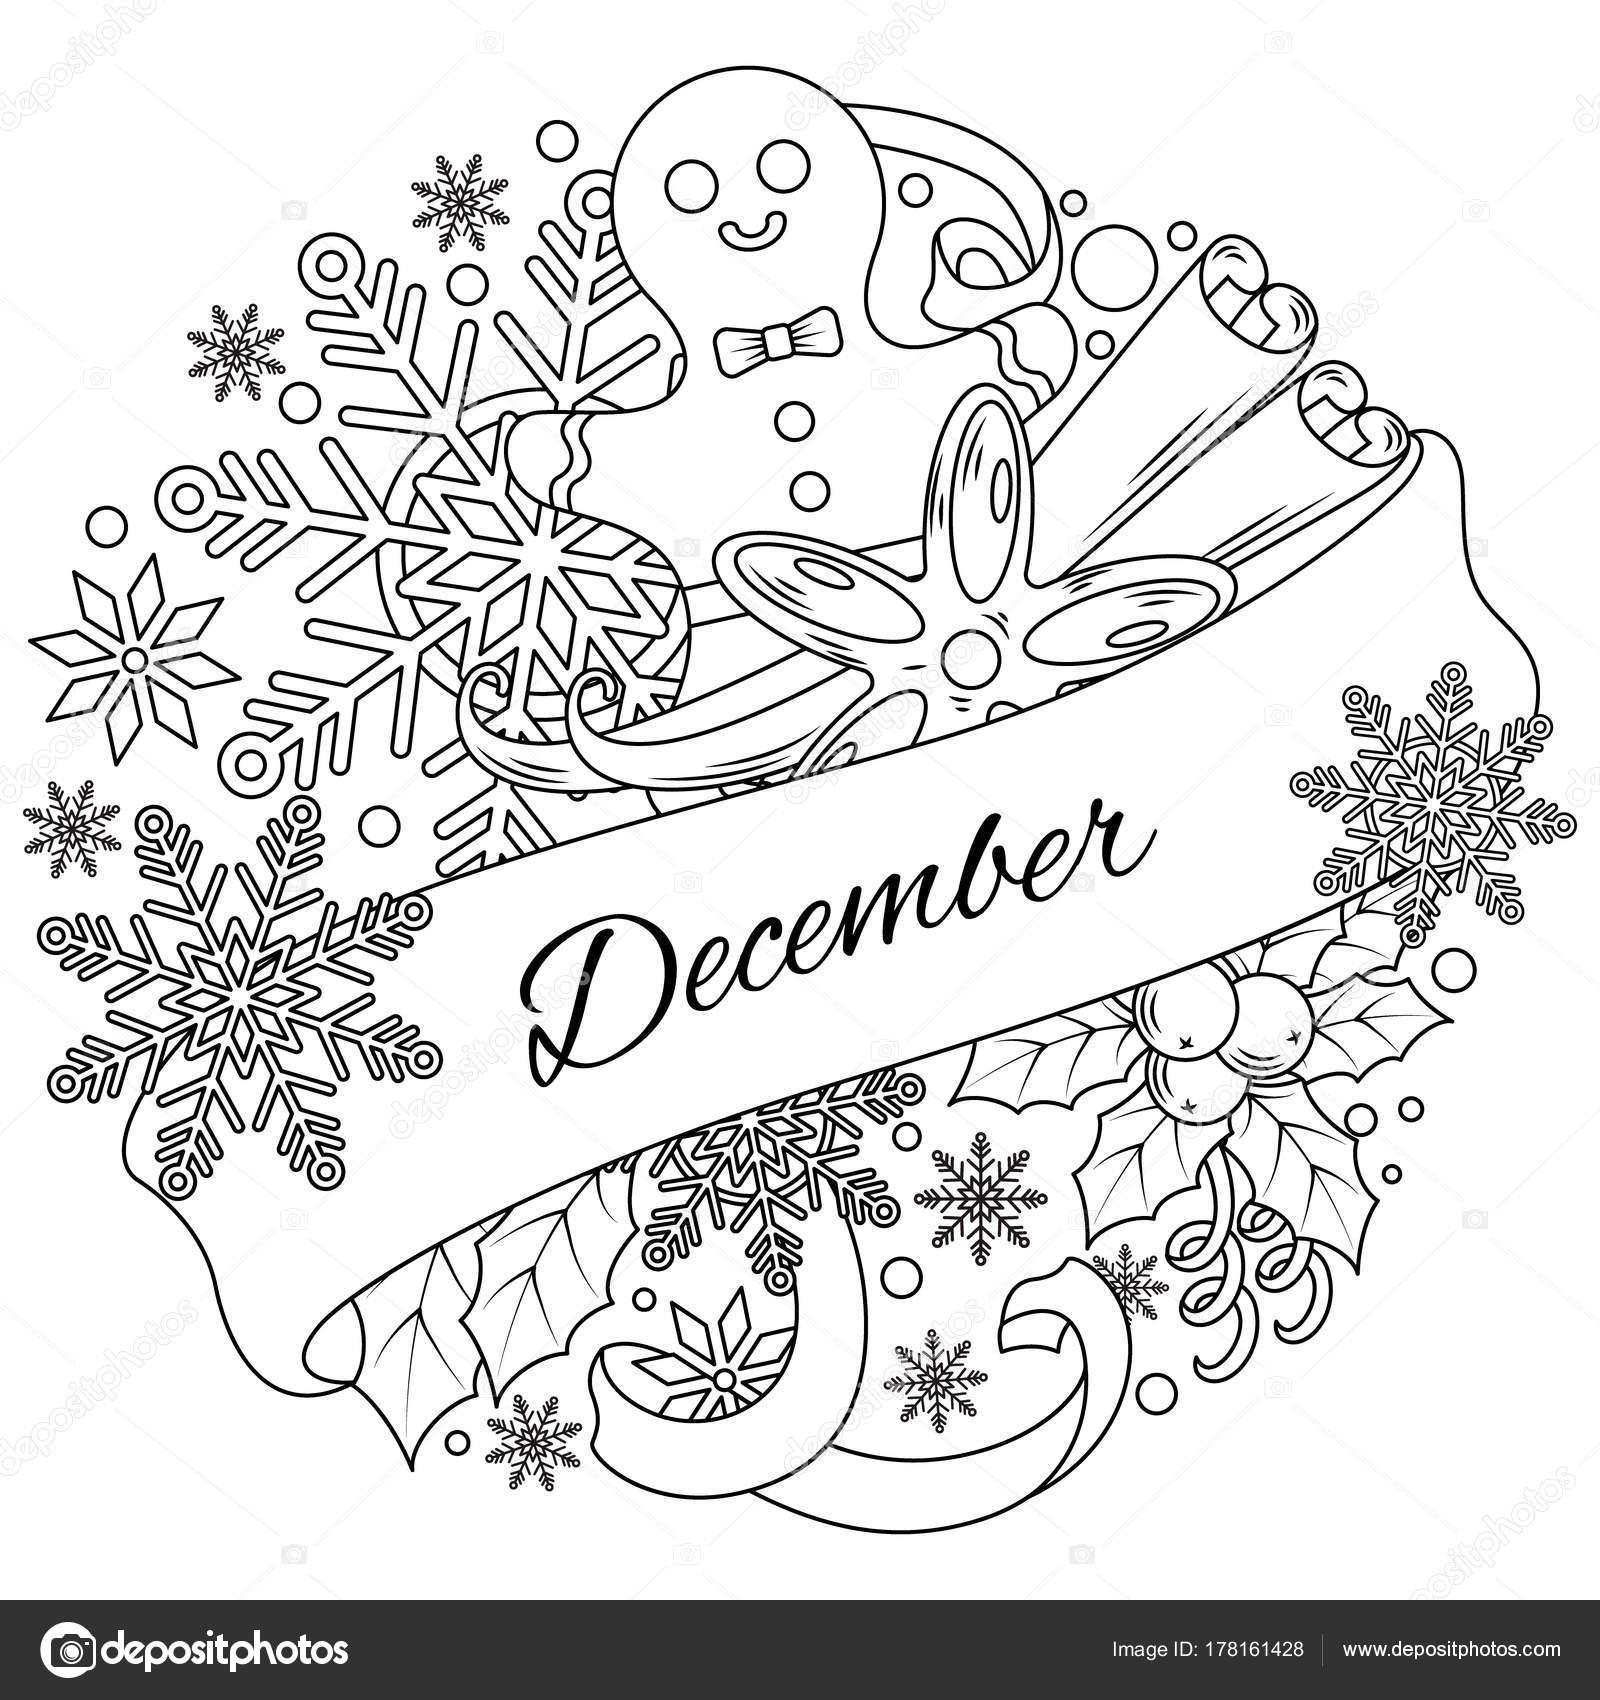 Diciembre. La disposición circular de elementos asociados con w ...